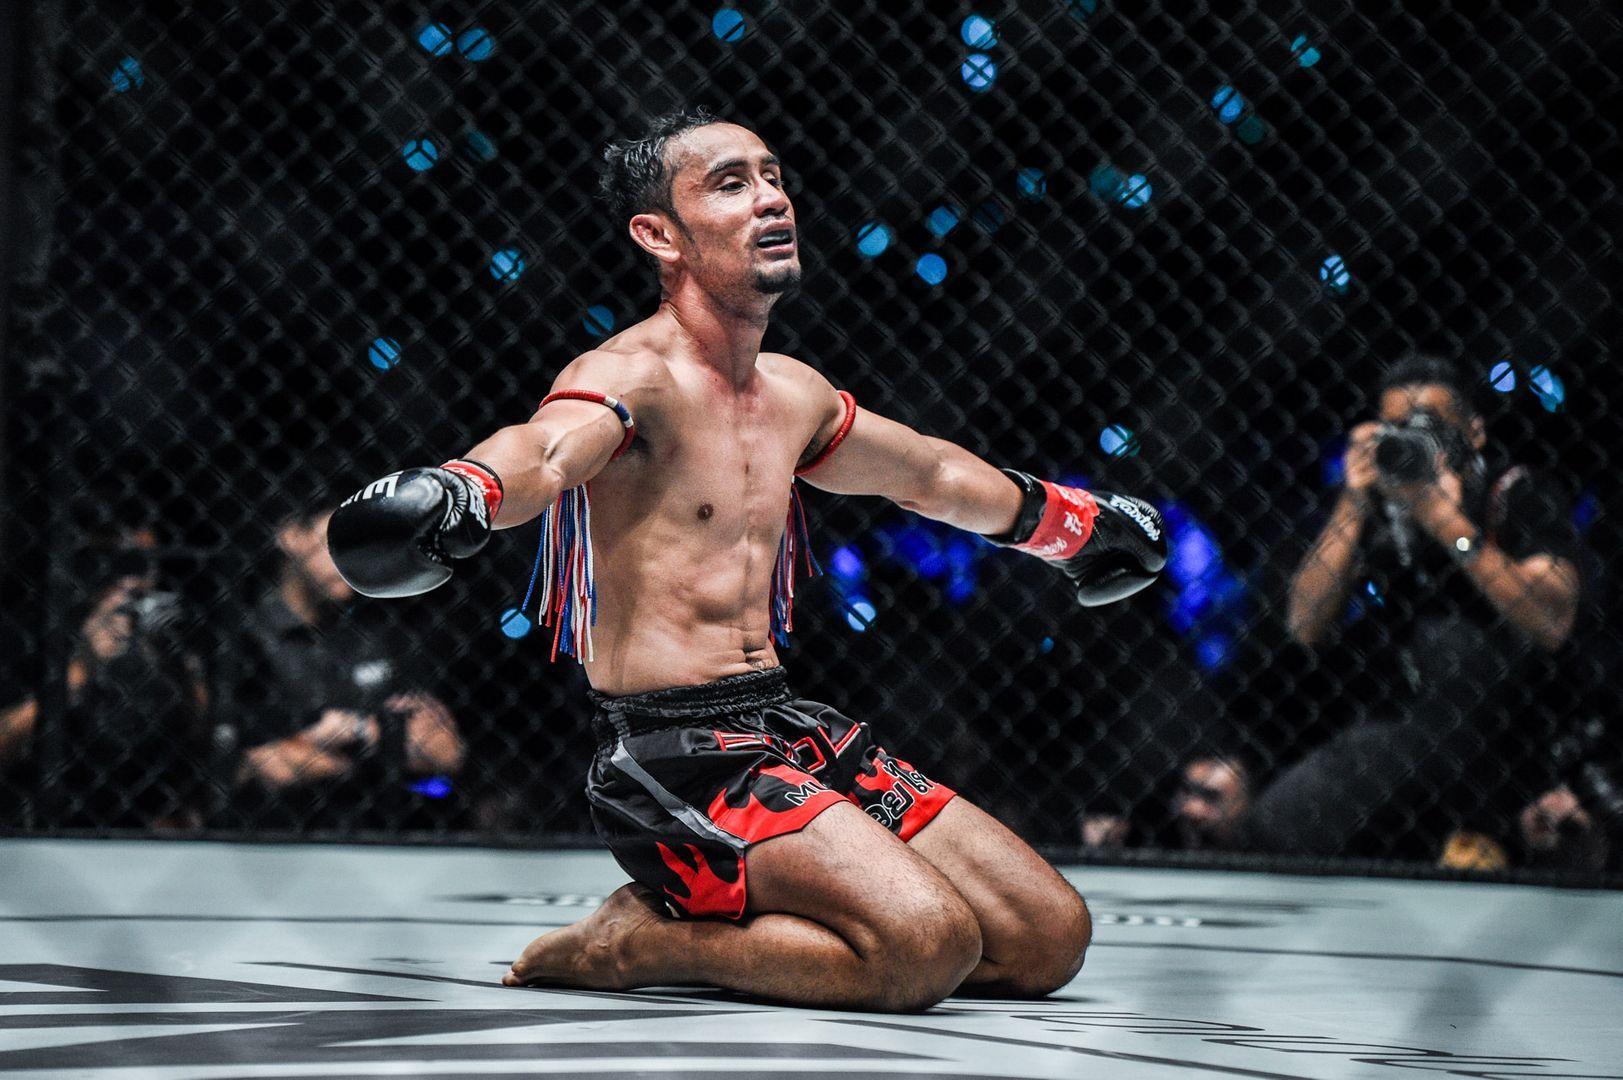 ONE Strawweight Kickboxing World Champion Sam-A Gaiyanghadao celebrates his win against Wang Junguang